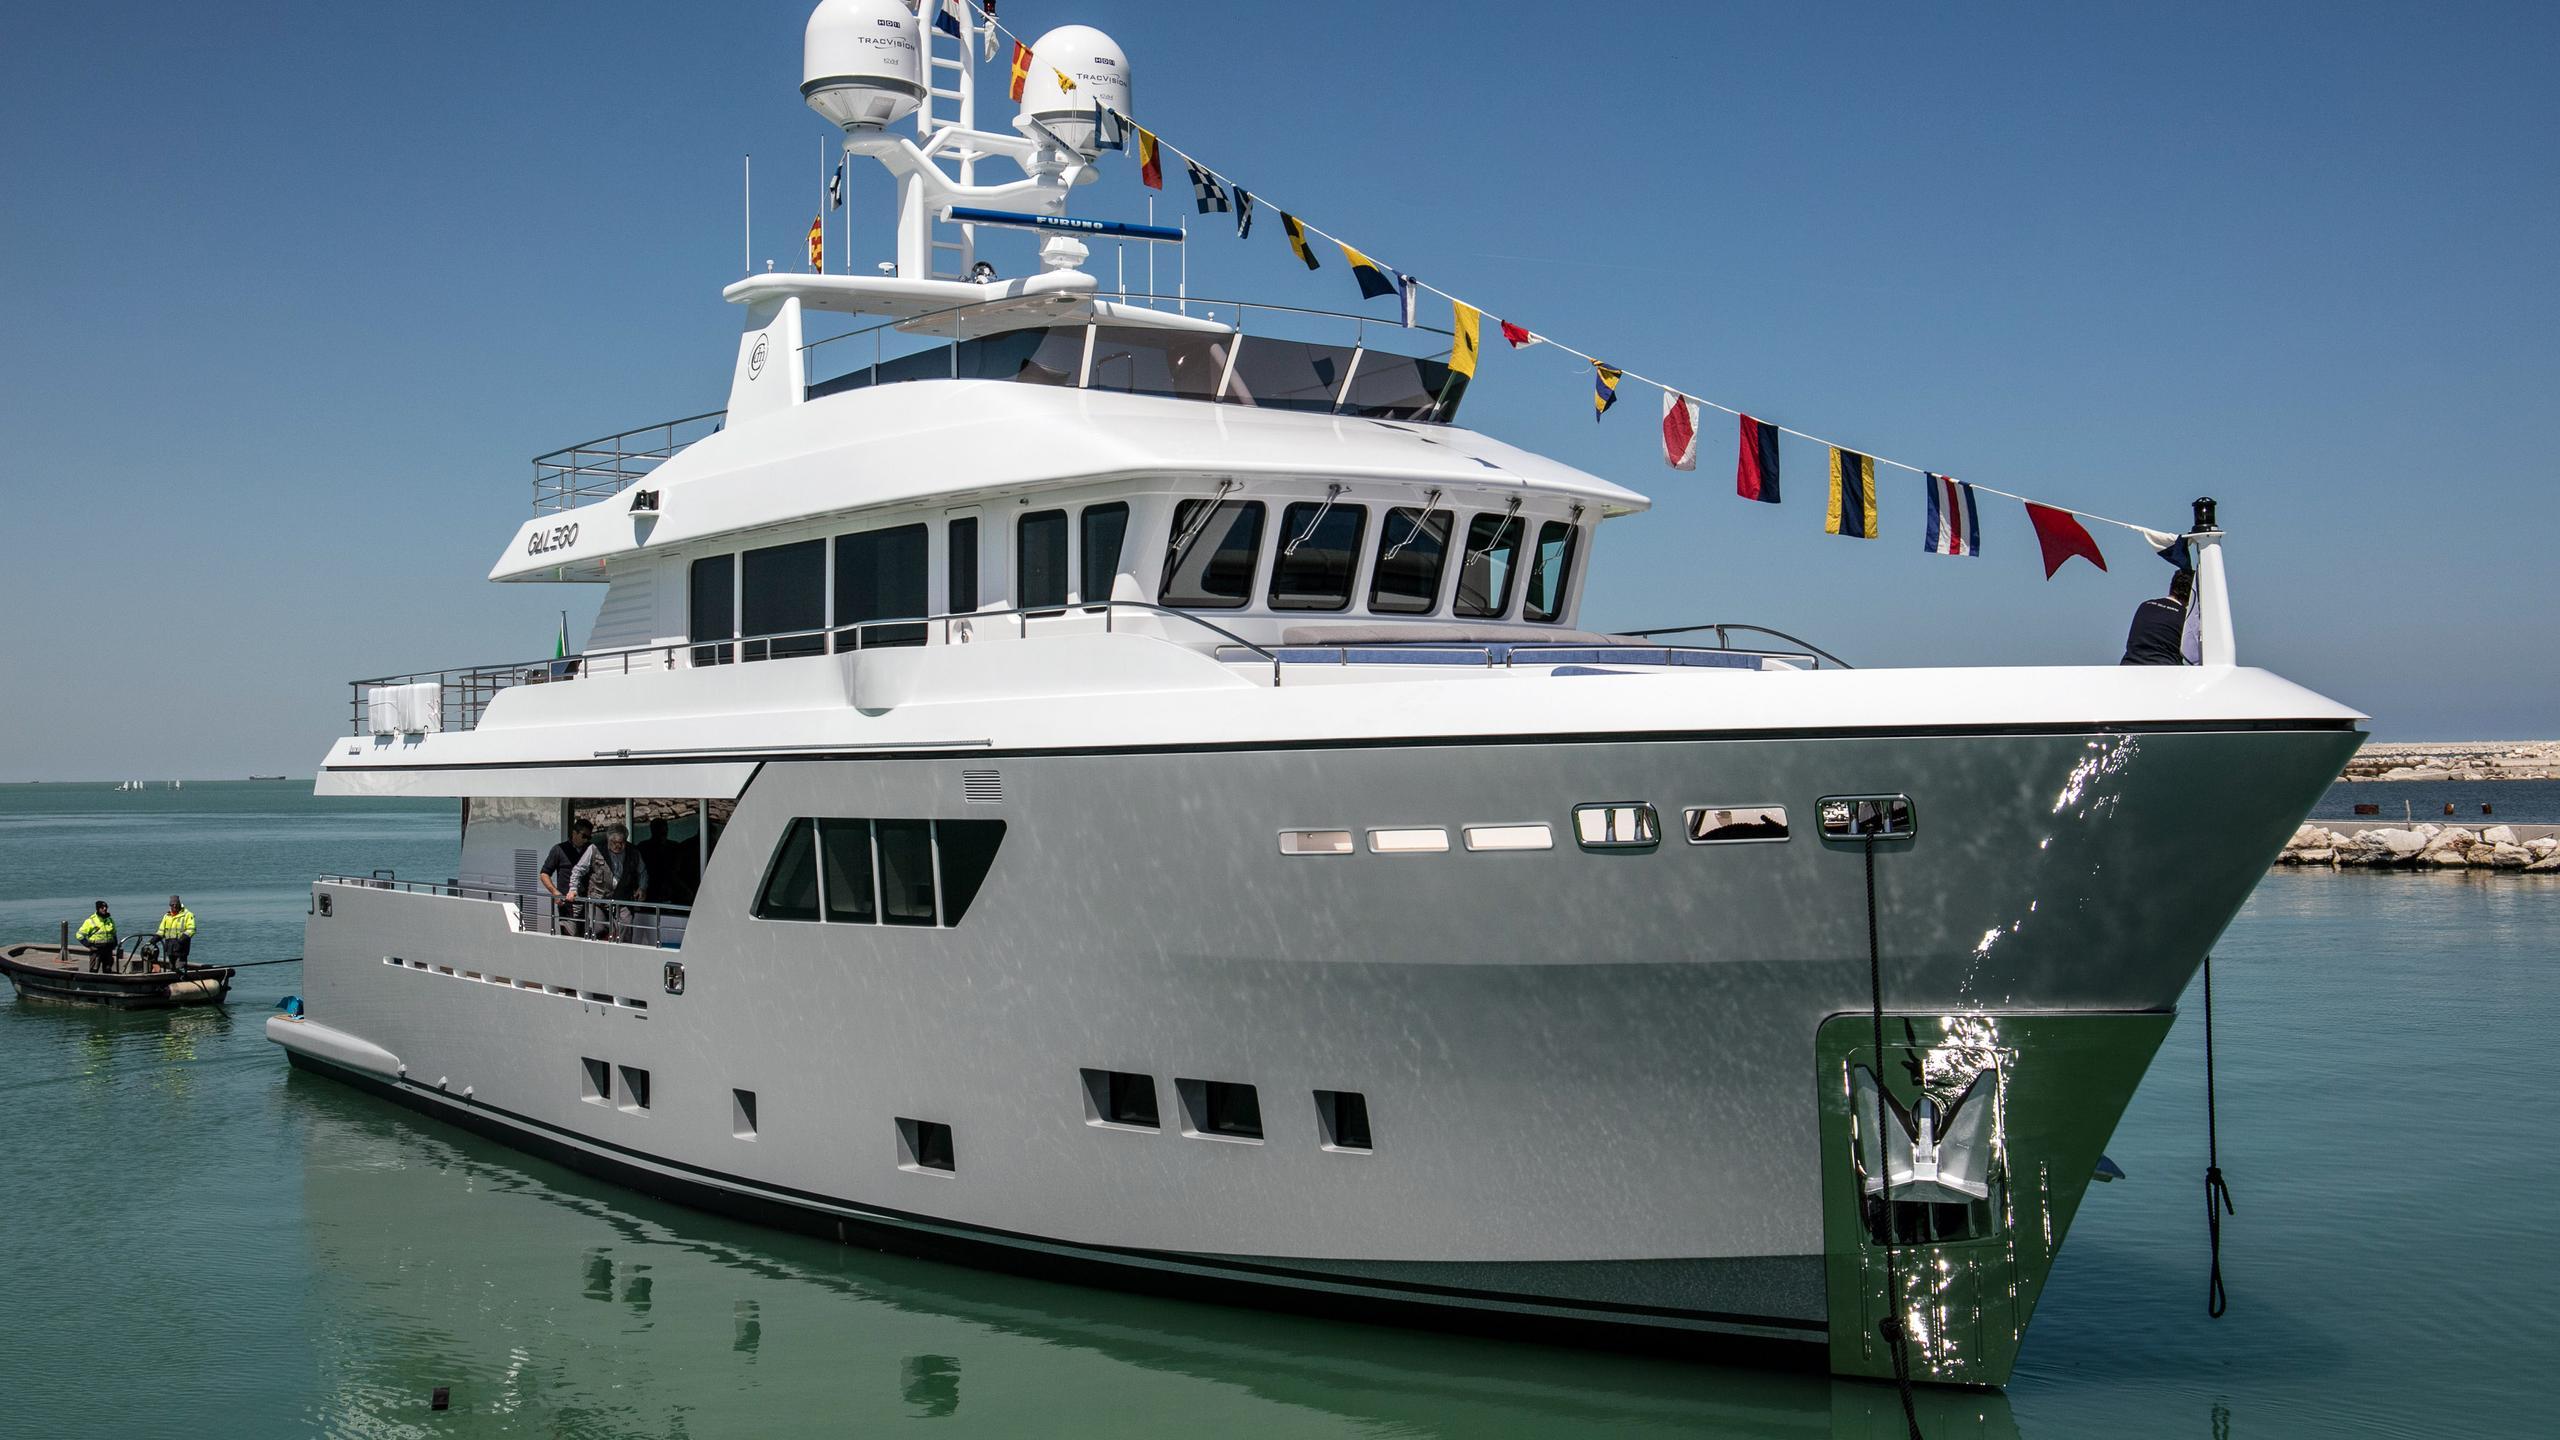 galego darwin 102 motoryacht cantiere delle marche 2017 31m launch half profile